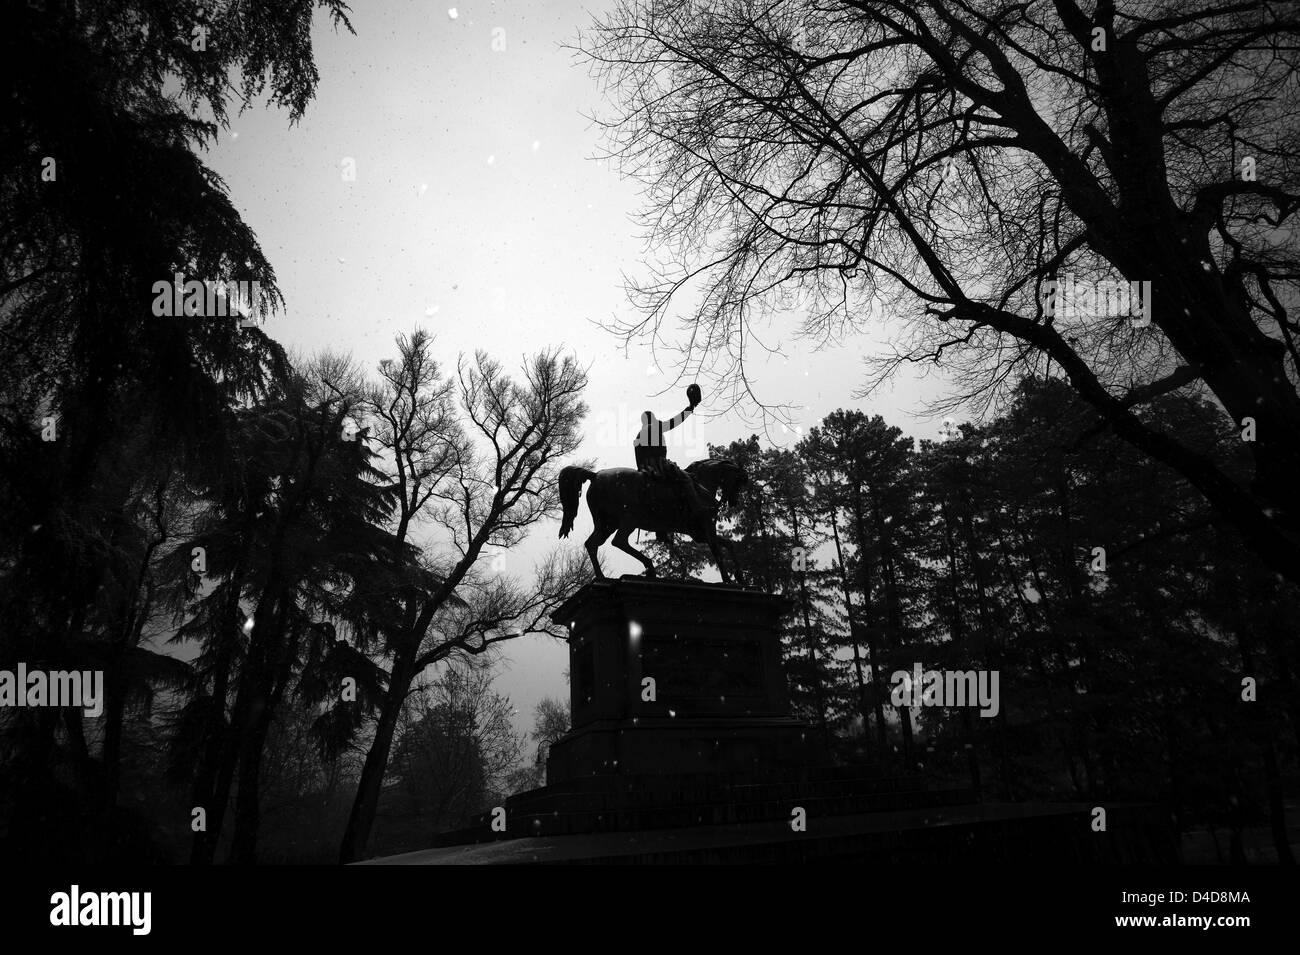 Milan. Sempione park. Statue of a man on horseback - Stock Image